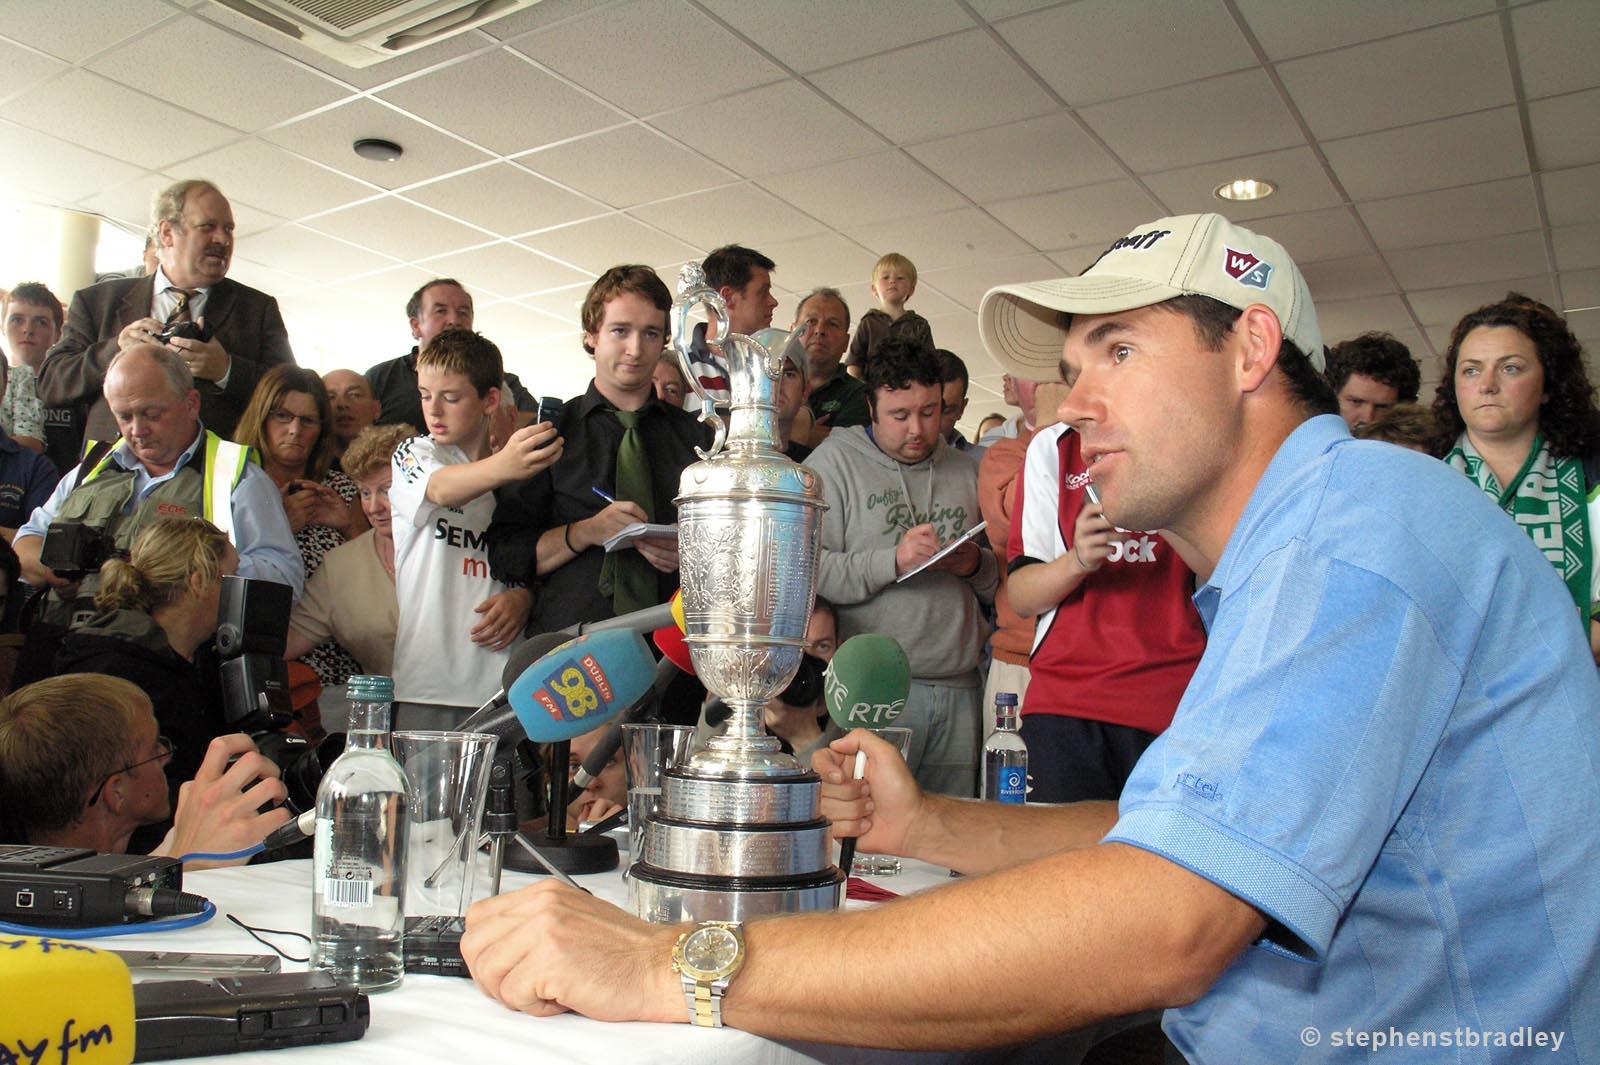 Editorial photographer Dublin portfolio photo 7235023 of Padraig Harrington arriving in Ireland after winning The Open Championship, by Stephen S T Bradley